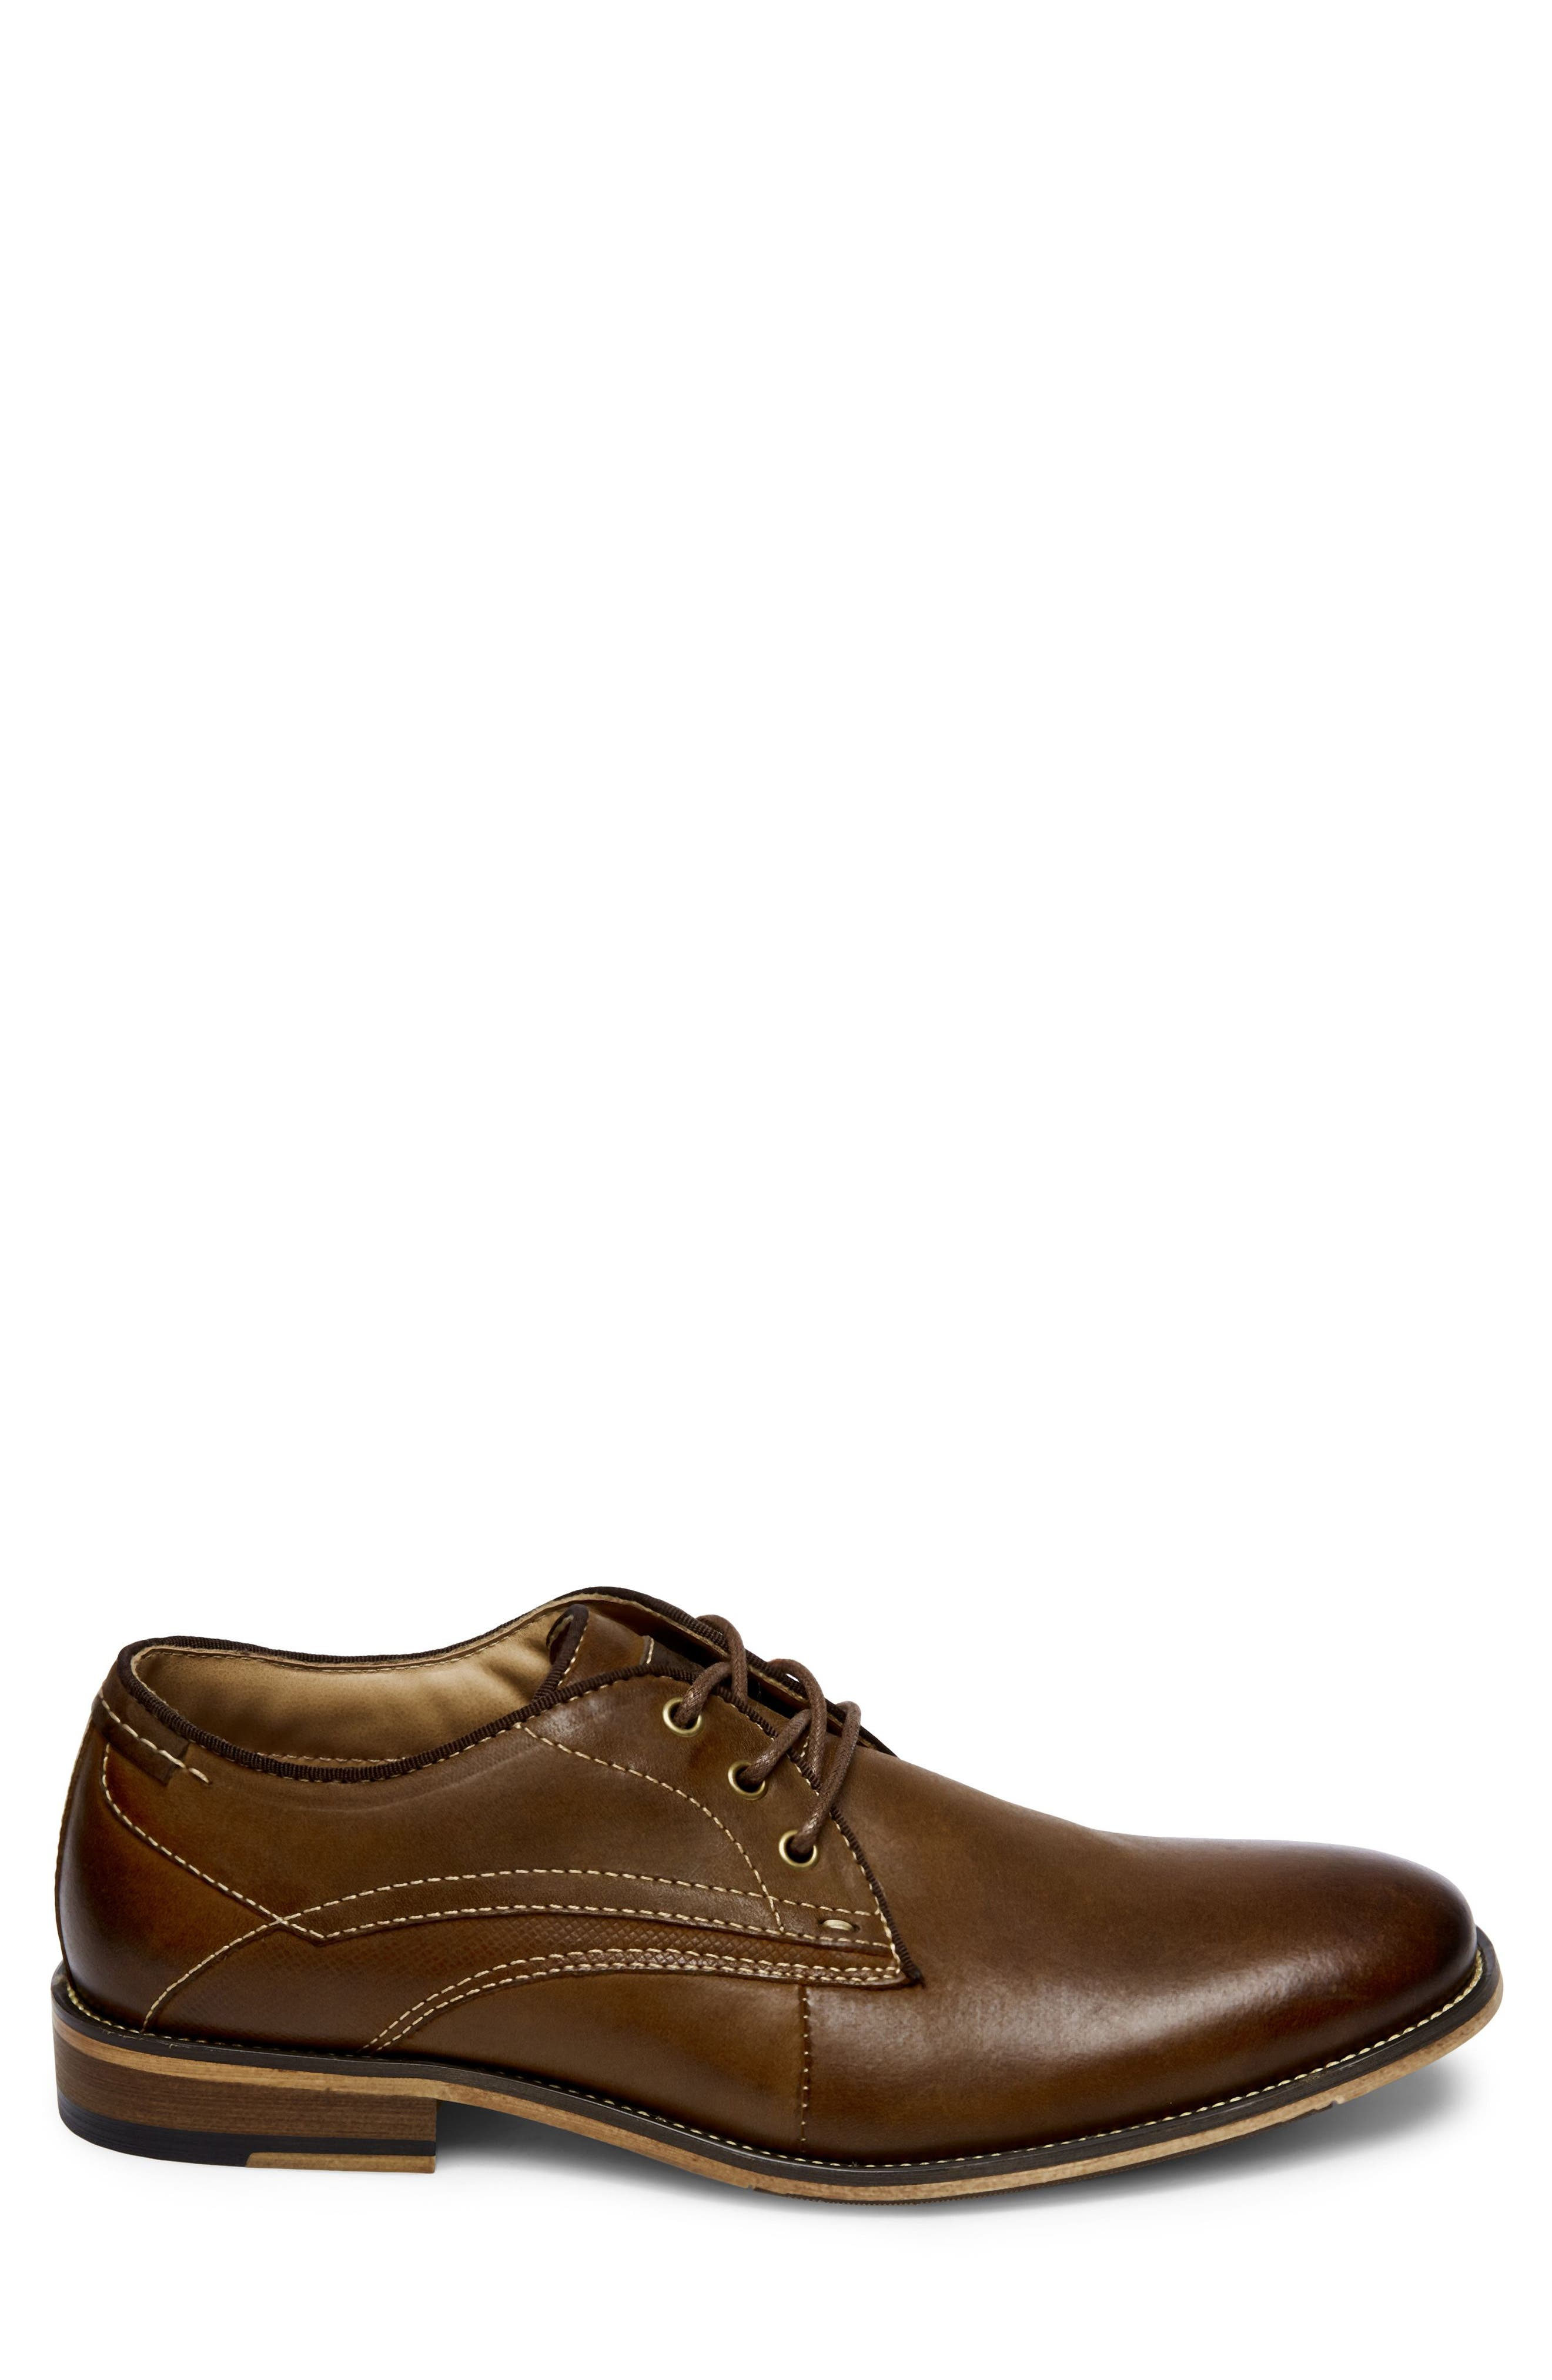 Jetset Plain Toe Derby,                             Alternate thumbnail 3, color,                             Dark Tan Leather